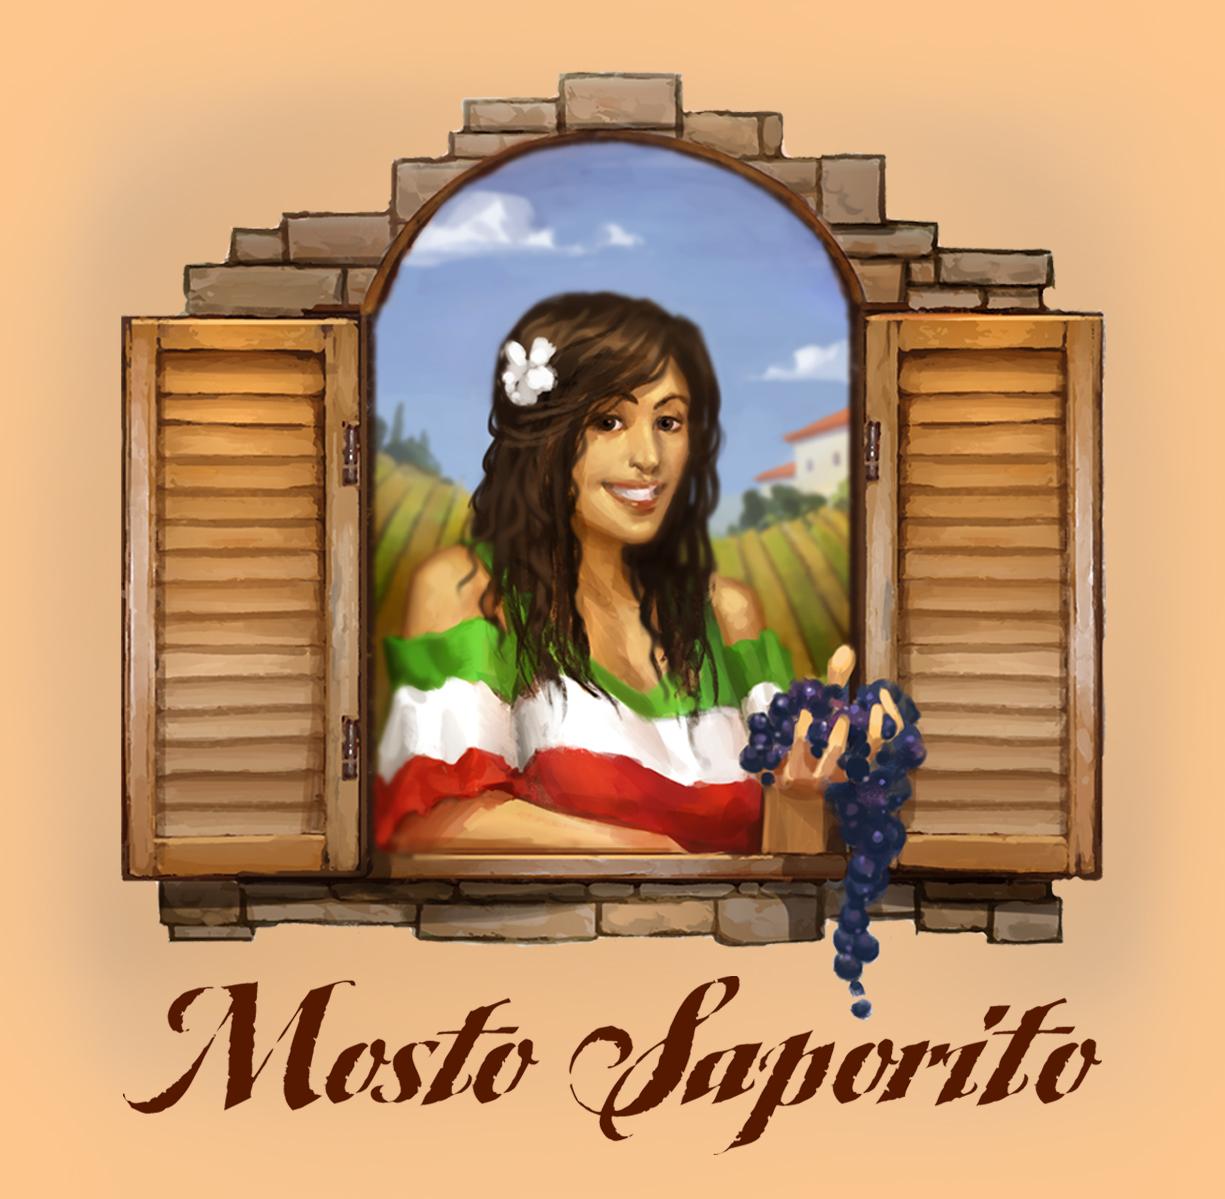 Mosto Saporito logo.jpg